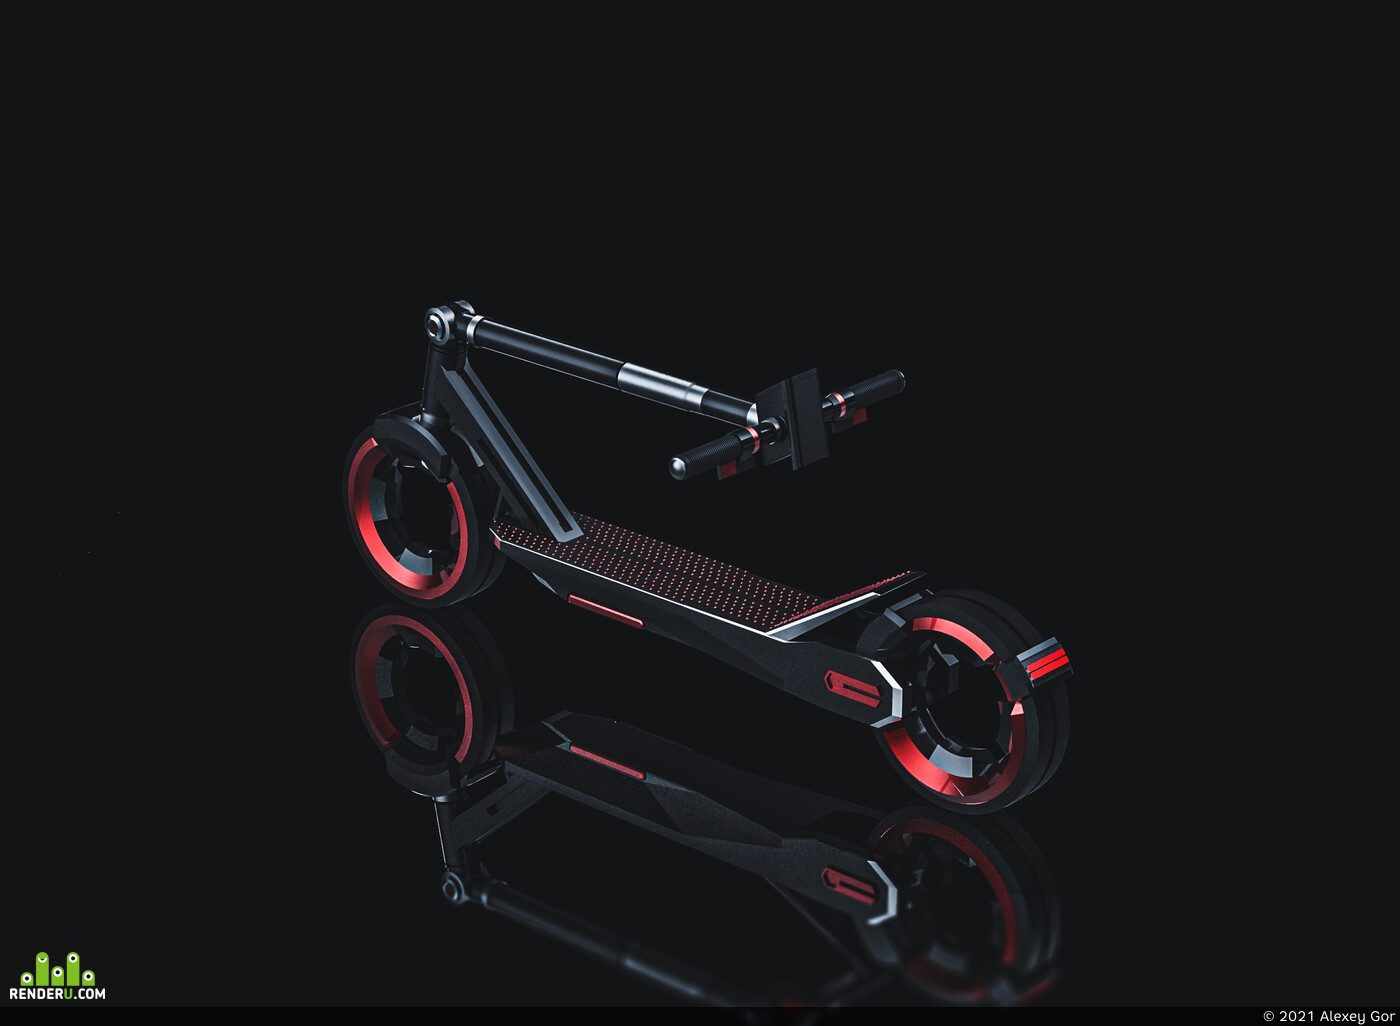 concept, graphic design, scooter, art